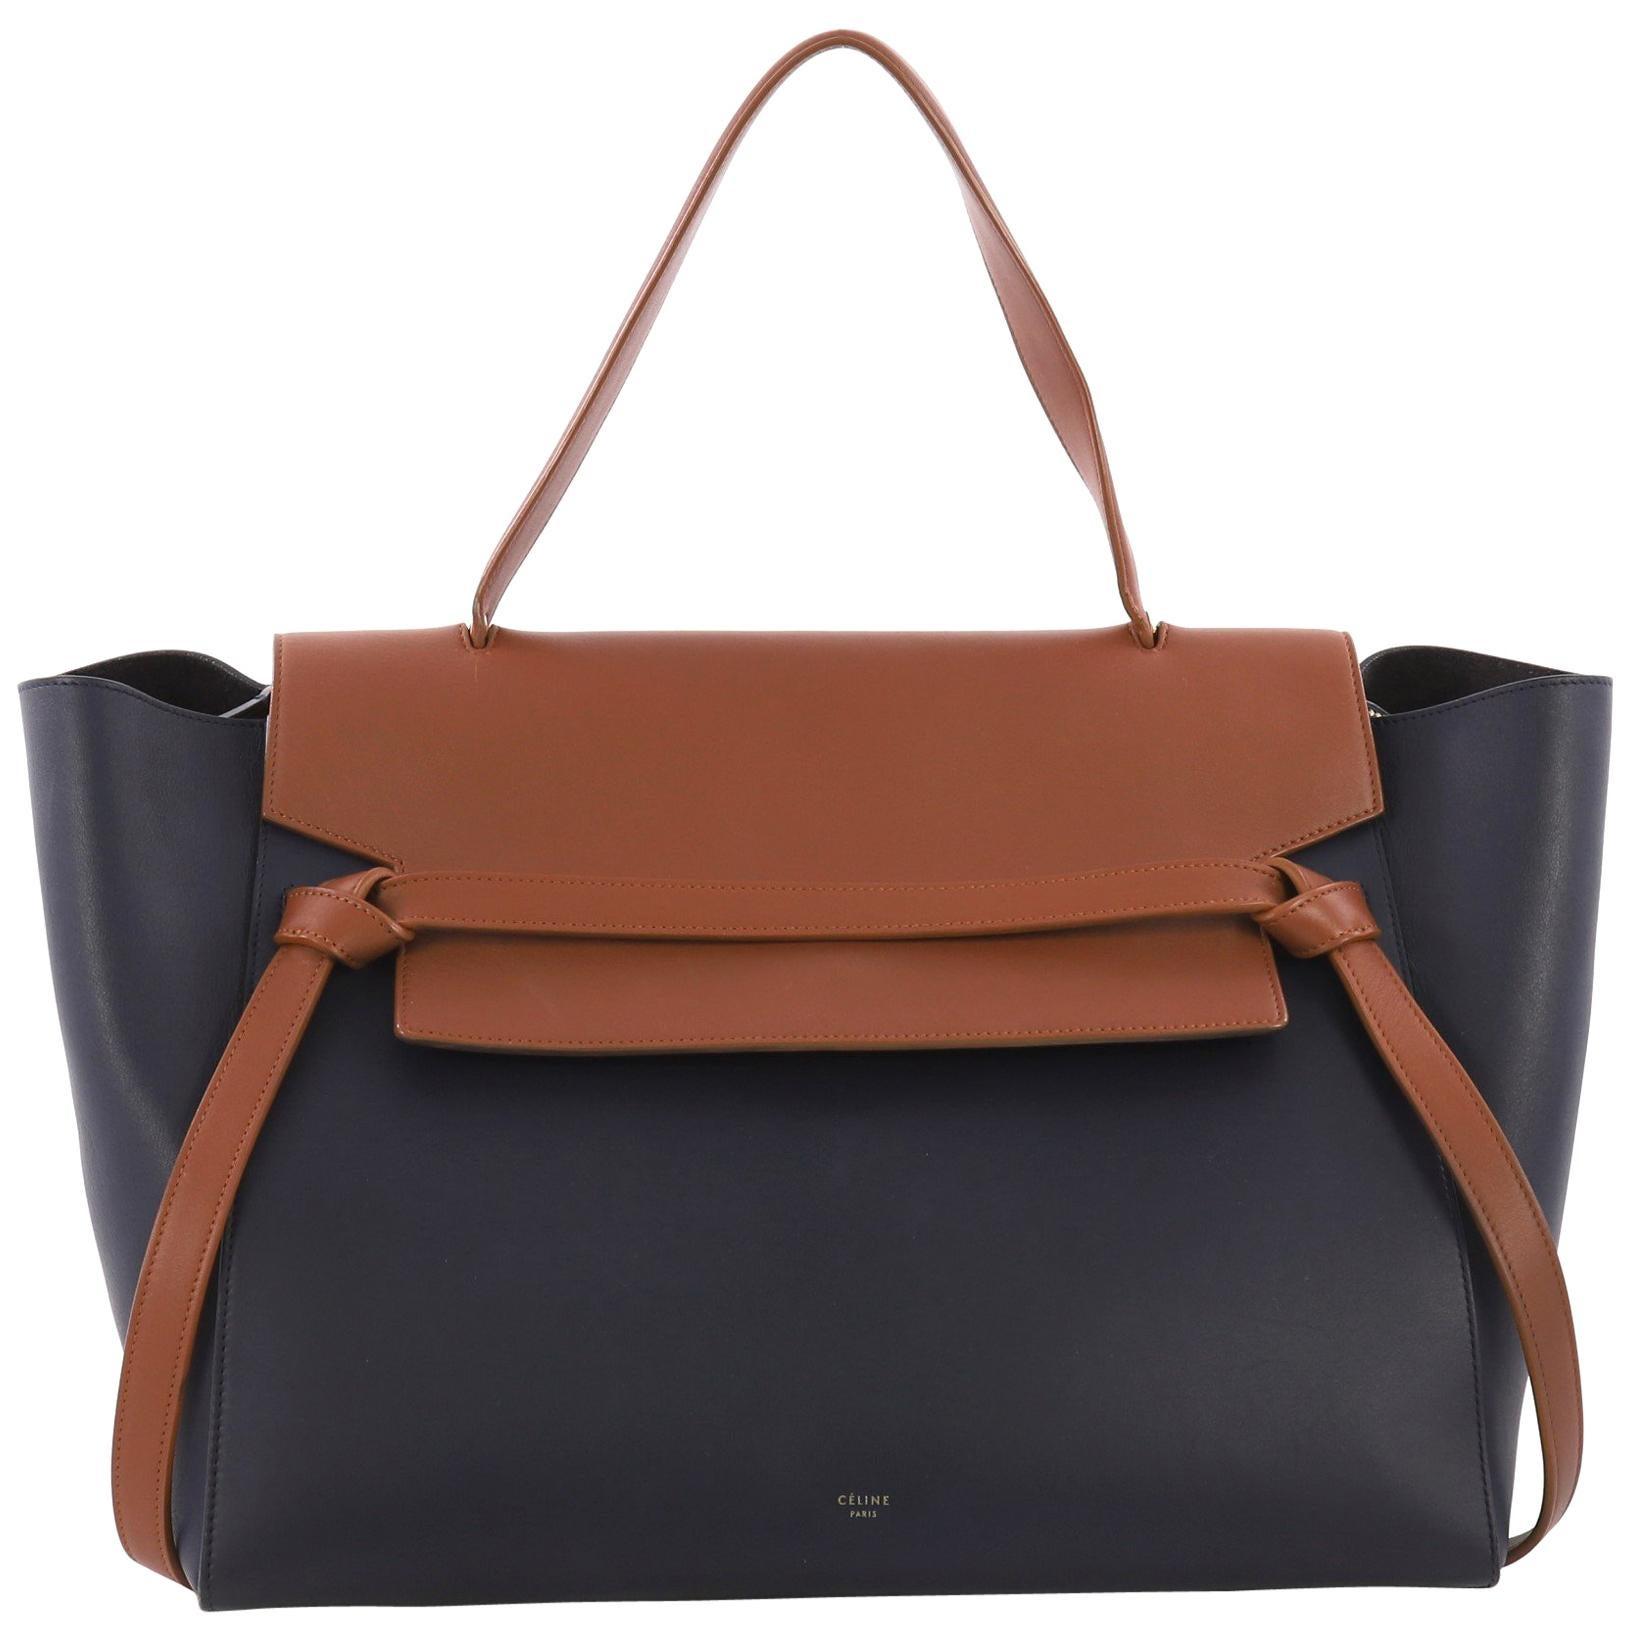 35c32b5822dd Celine Leather Handbags - 113 For Sale on 1stdibs